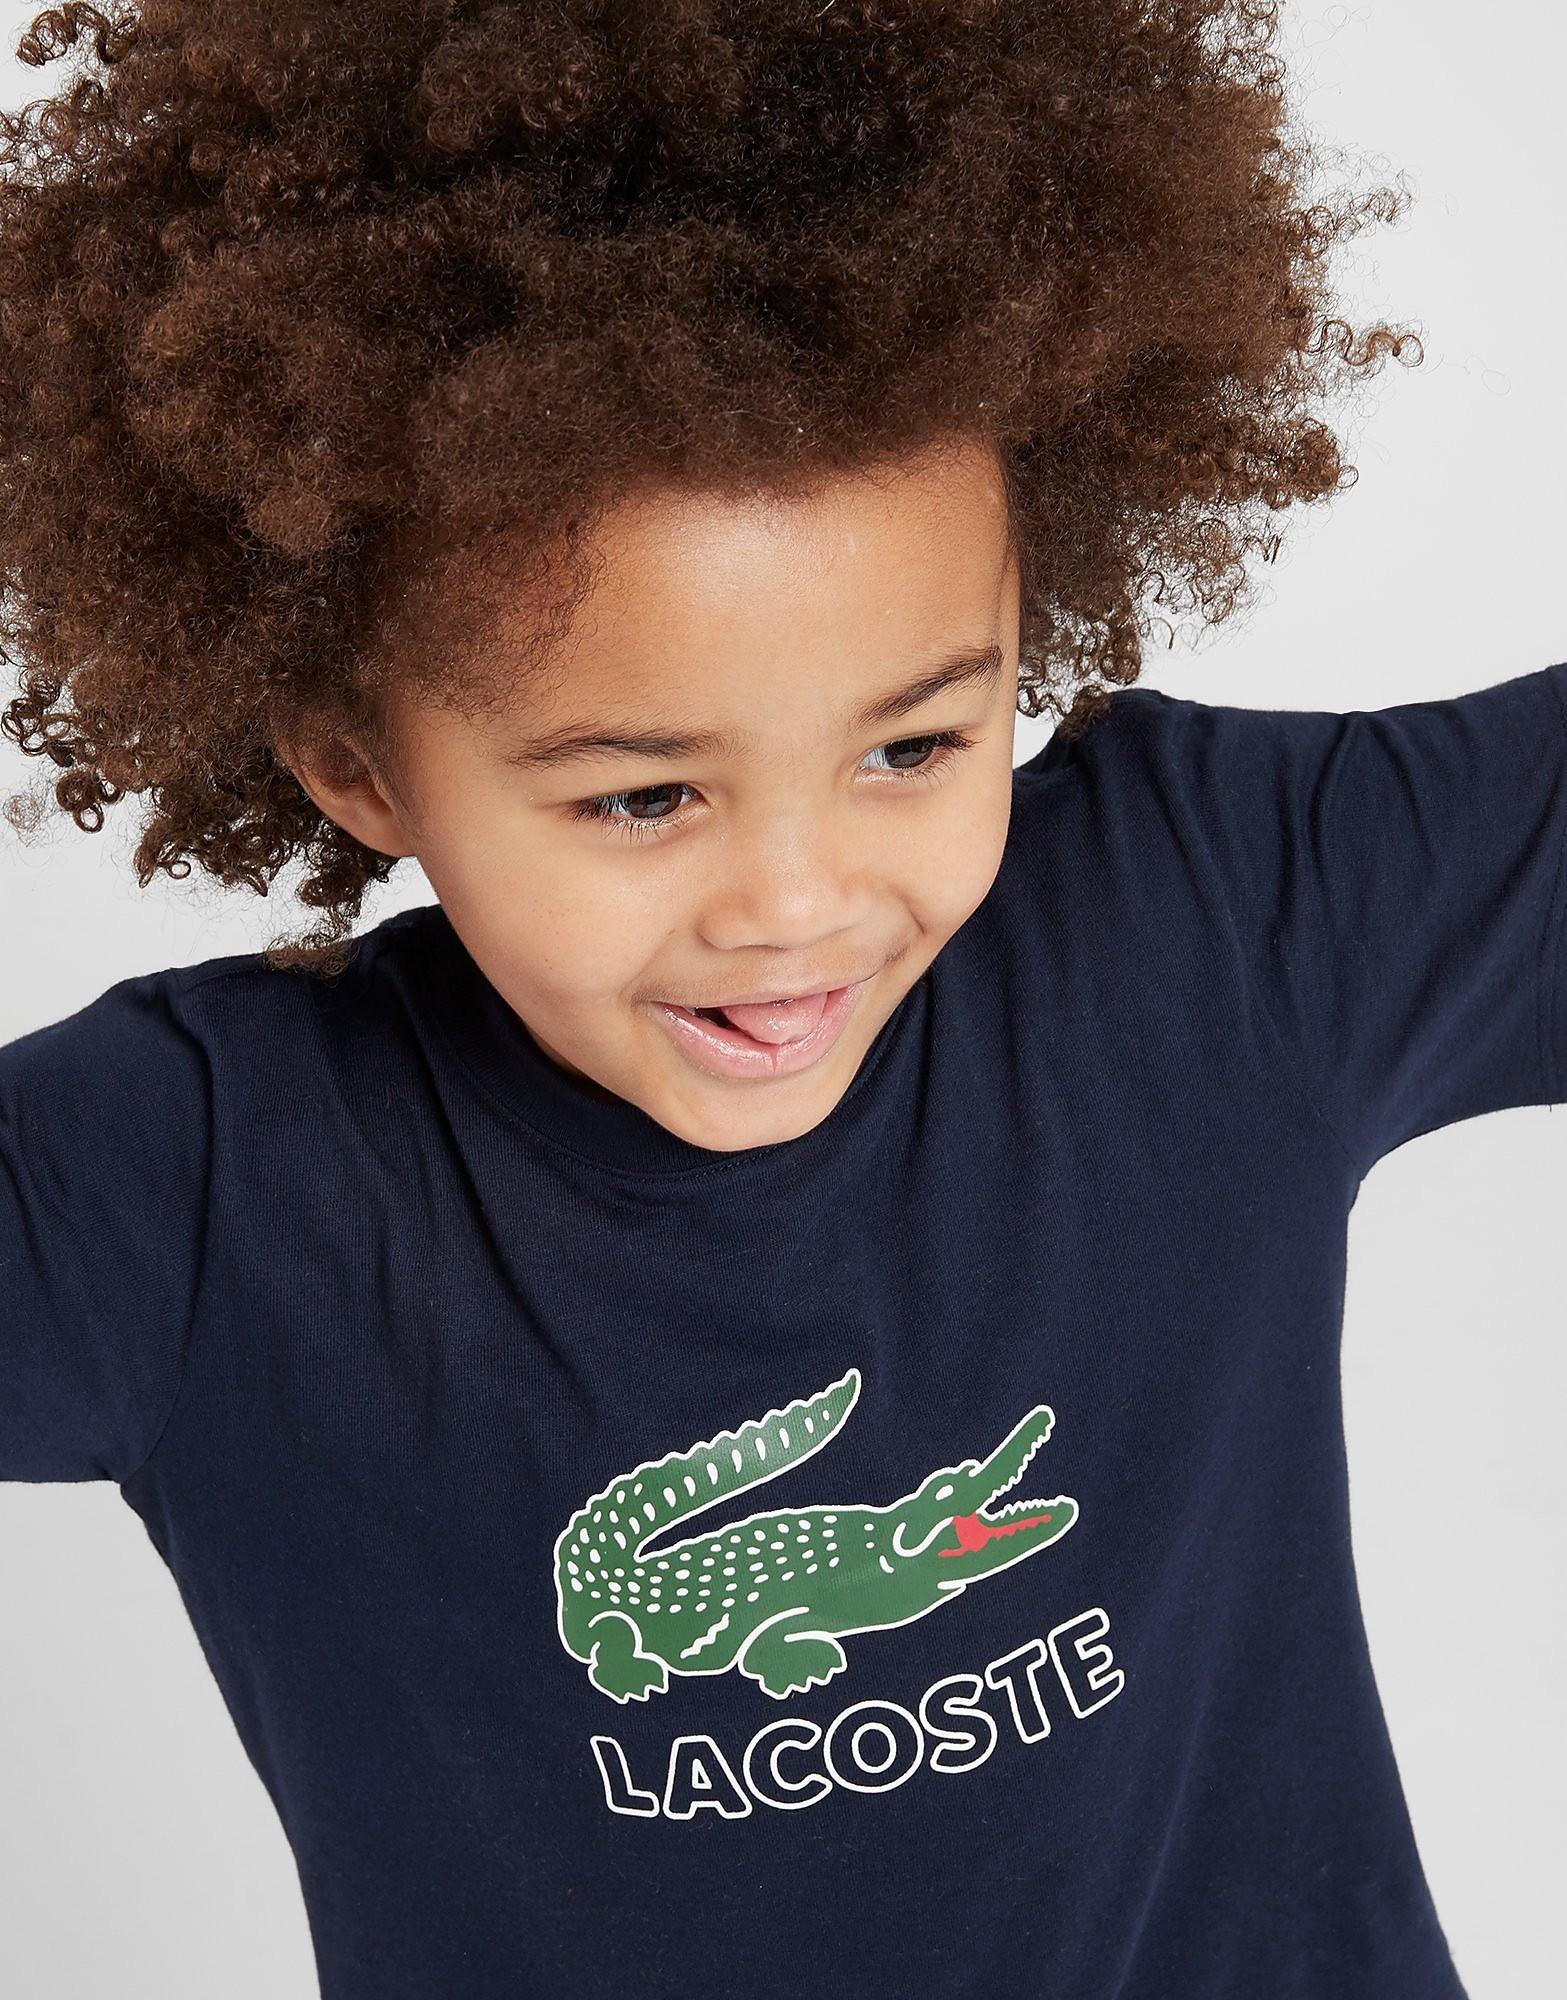 Lacoste Vintage Croc T-Shirt Children - Blauw - Kind